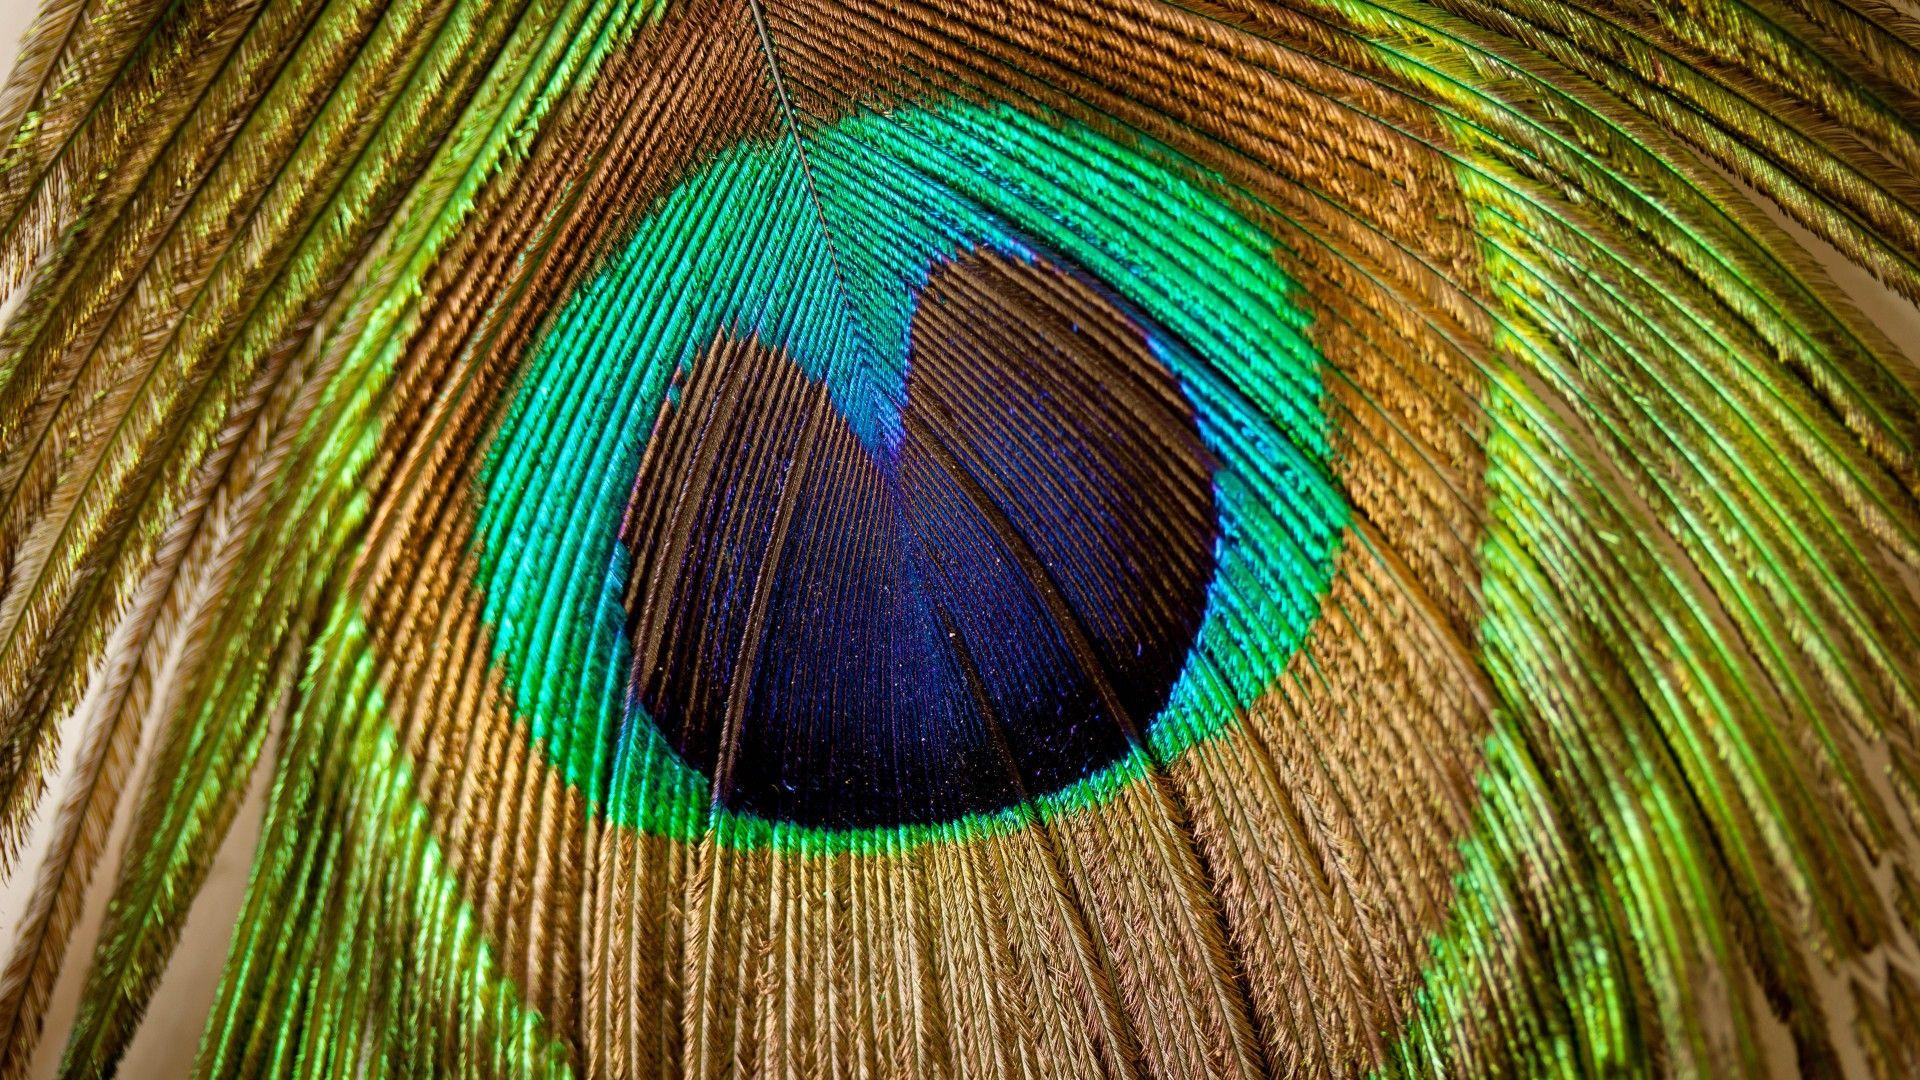 Feather Bloom desktop background free